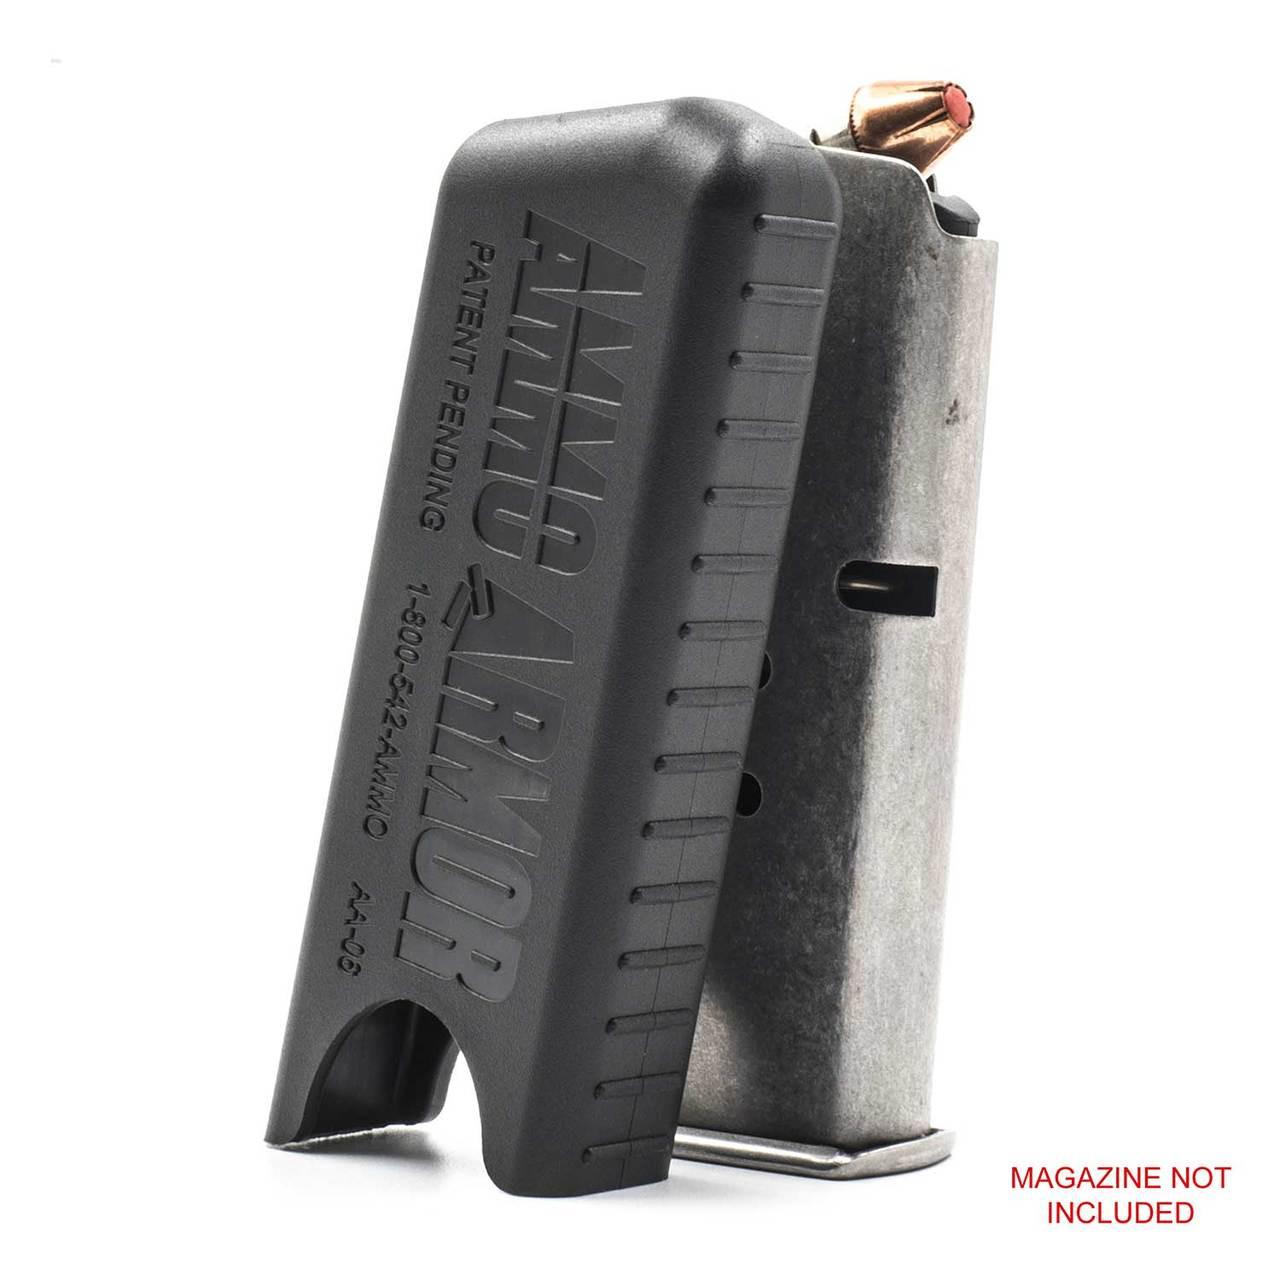 Walther PK380 Magazine Protector